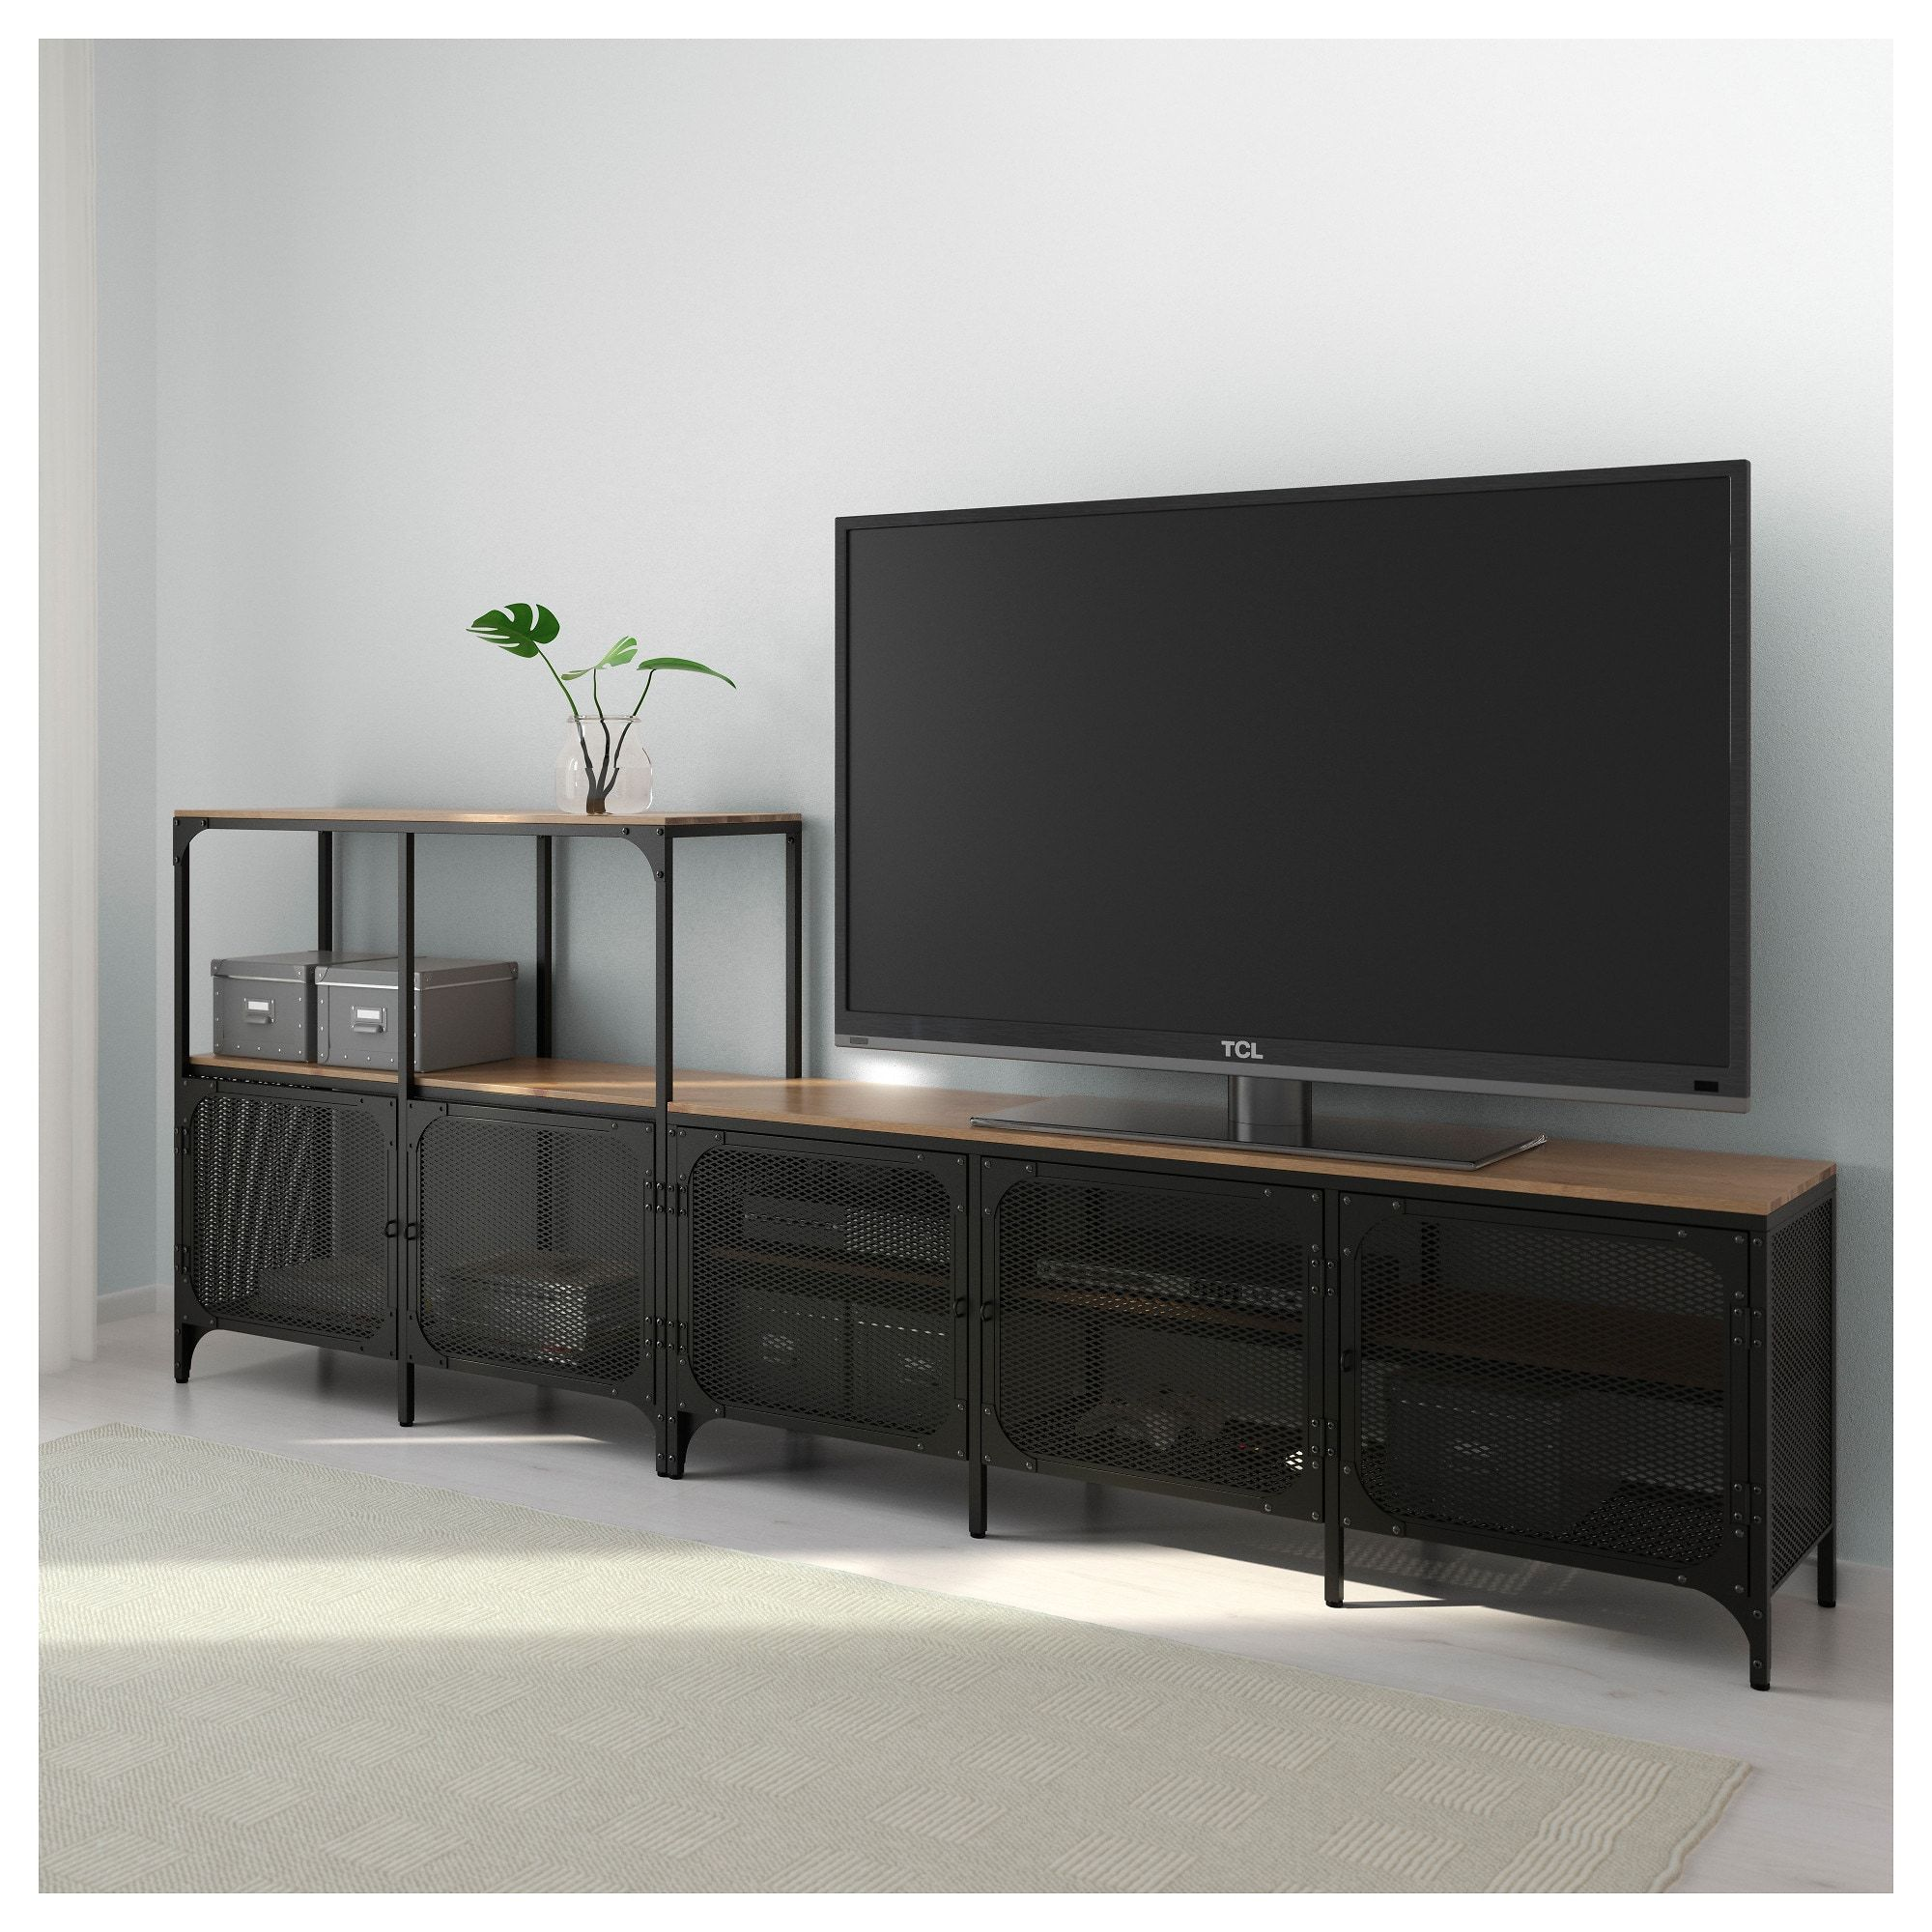 Fjallbo Black Tv Storage Combination 250x36x95 Cm Ikea In 2021 Tv Storage Ikea Tv Tv Bench [ 2000 x 2000 Pixel ]